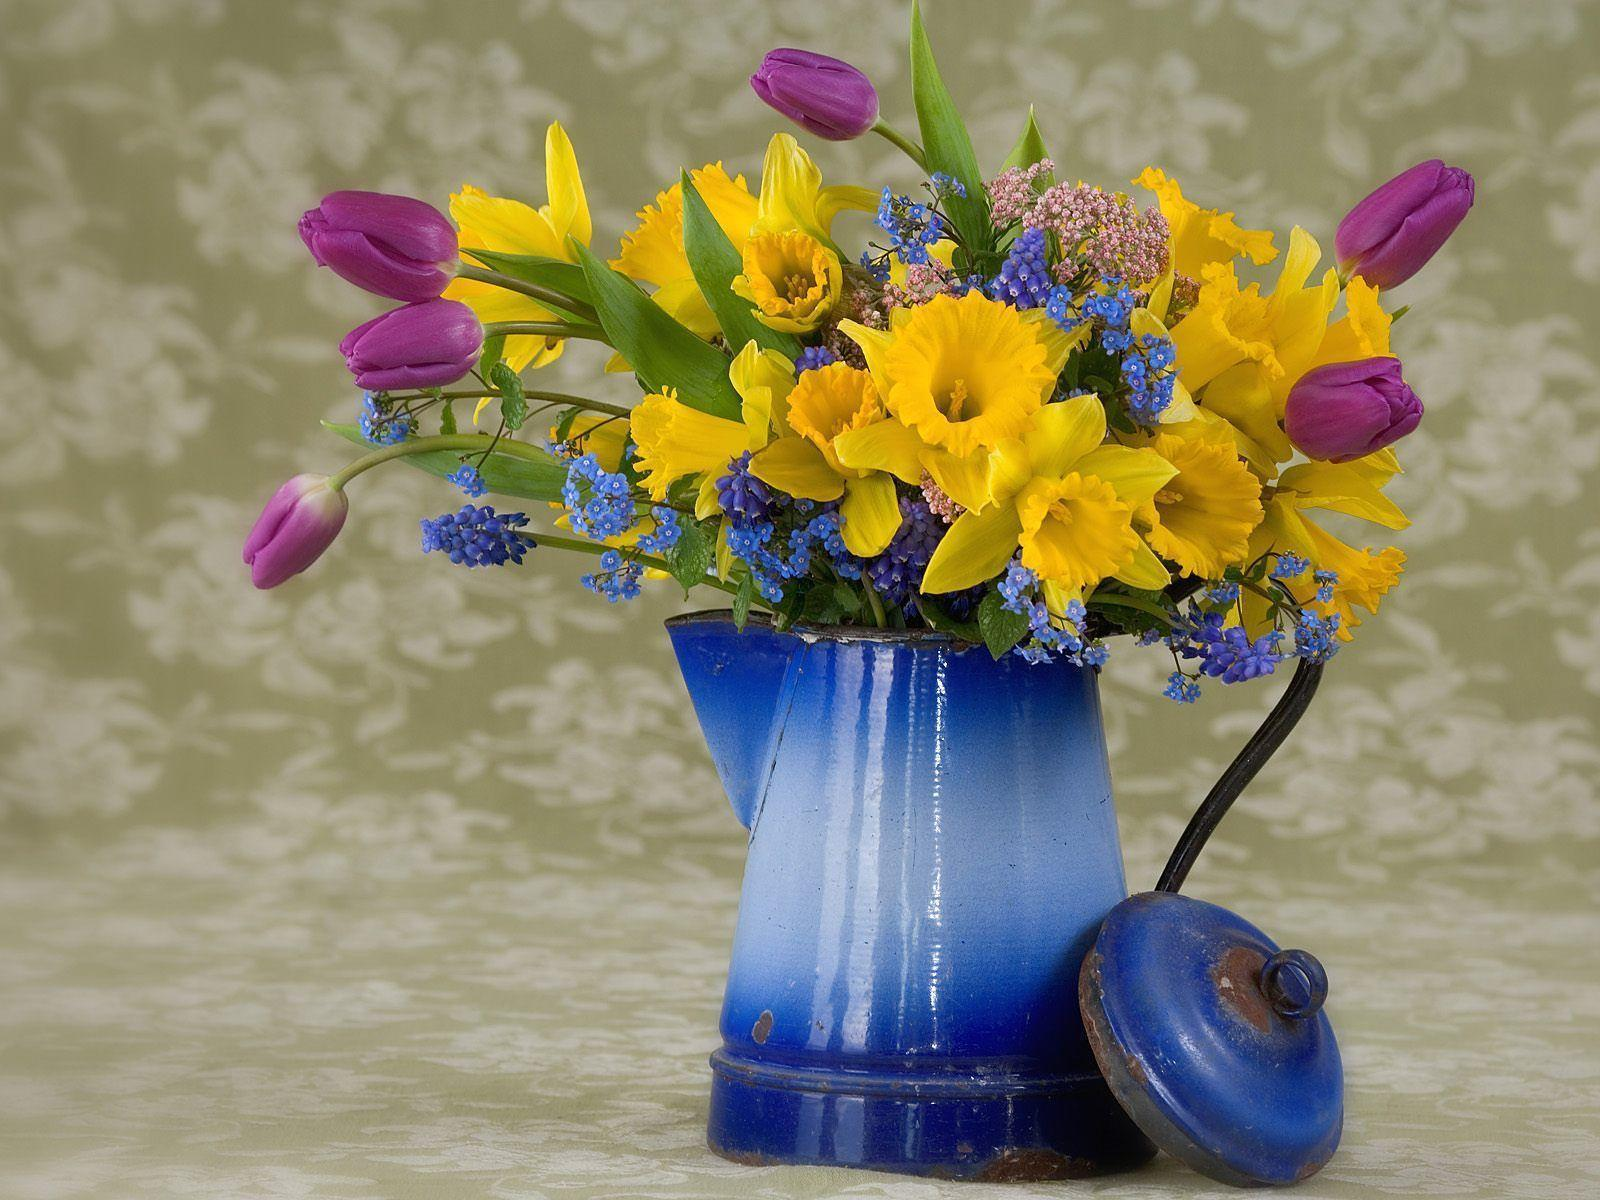 Free Desktop Wallpapers Spring Flowers Wallpaper Cave